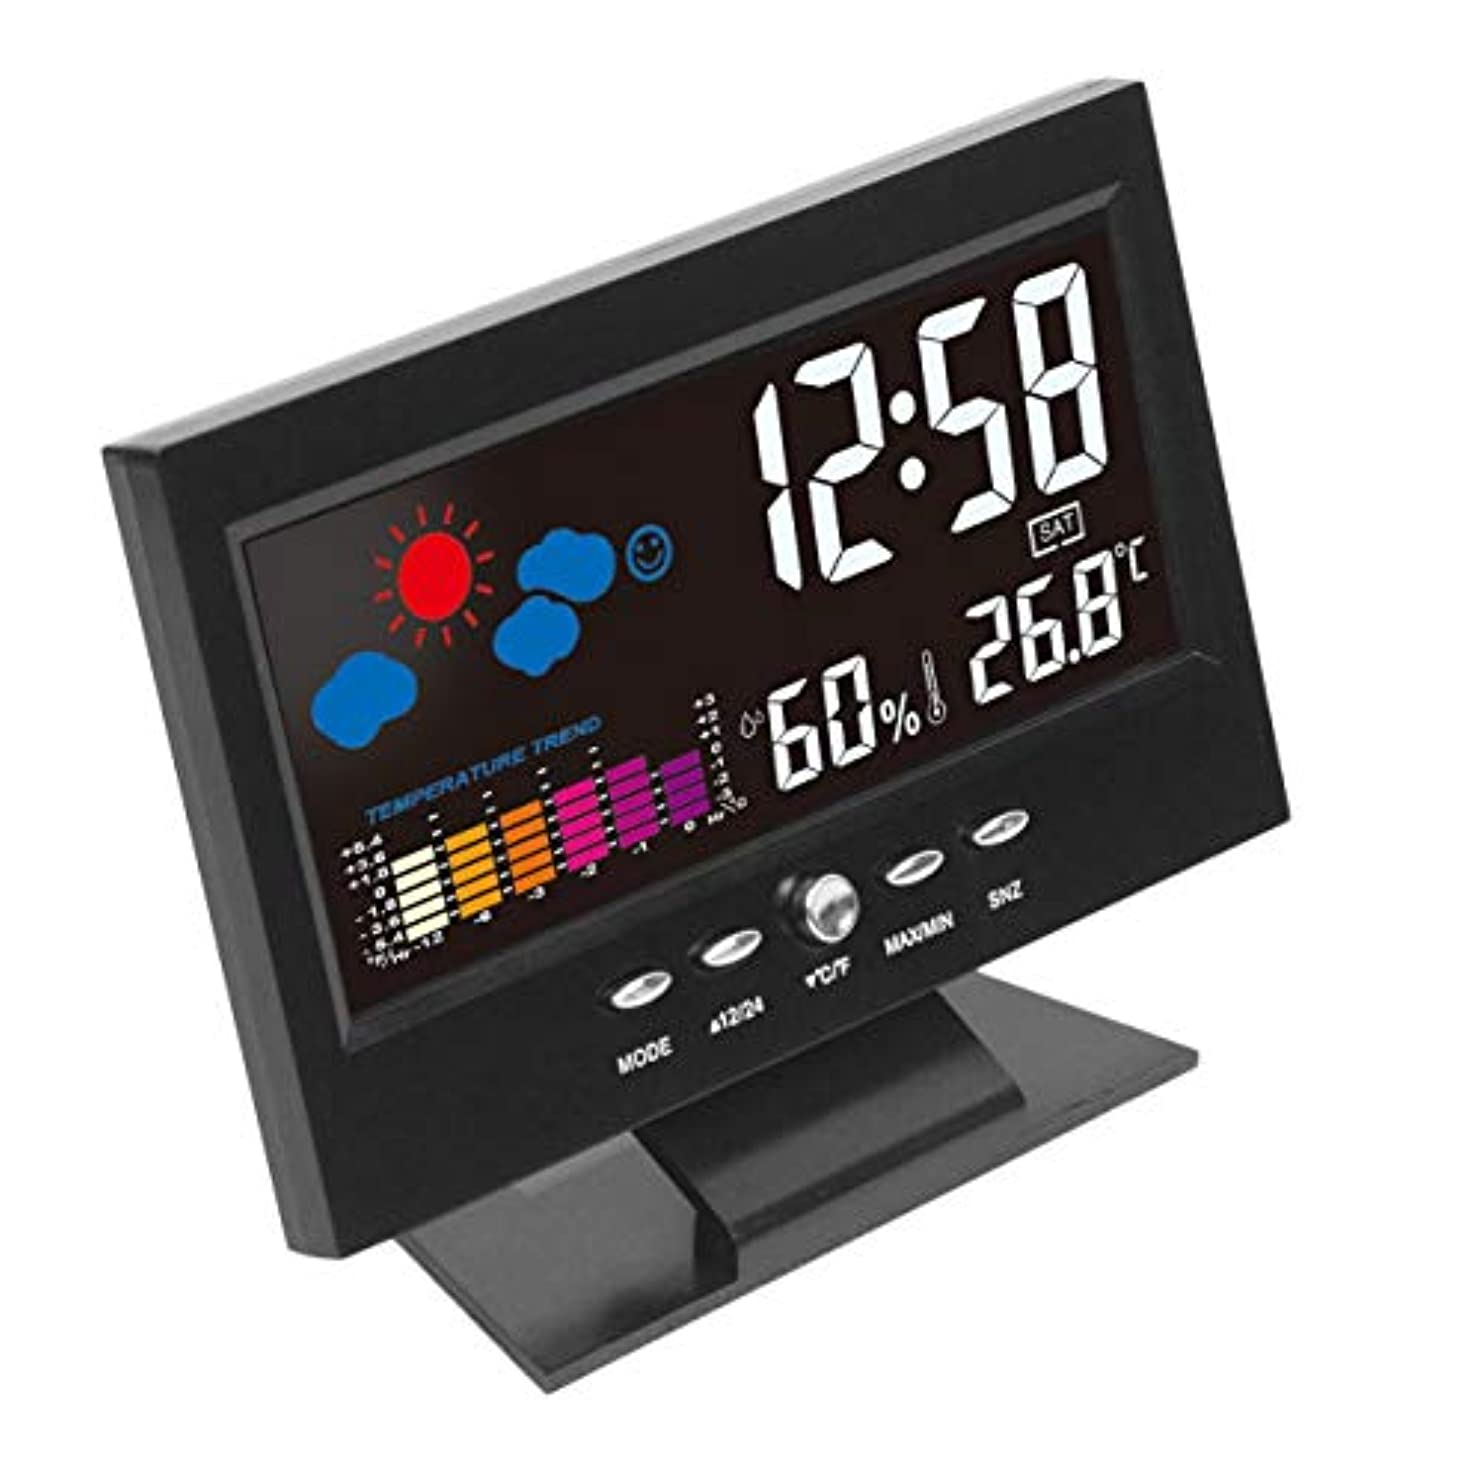 Saikogoods 電子デジタルLCD 温度湿度モニター時計 温度計湿度計 屋内ホーム 天気予報時??計 ブラック